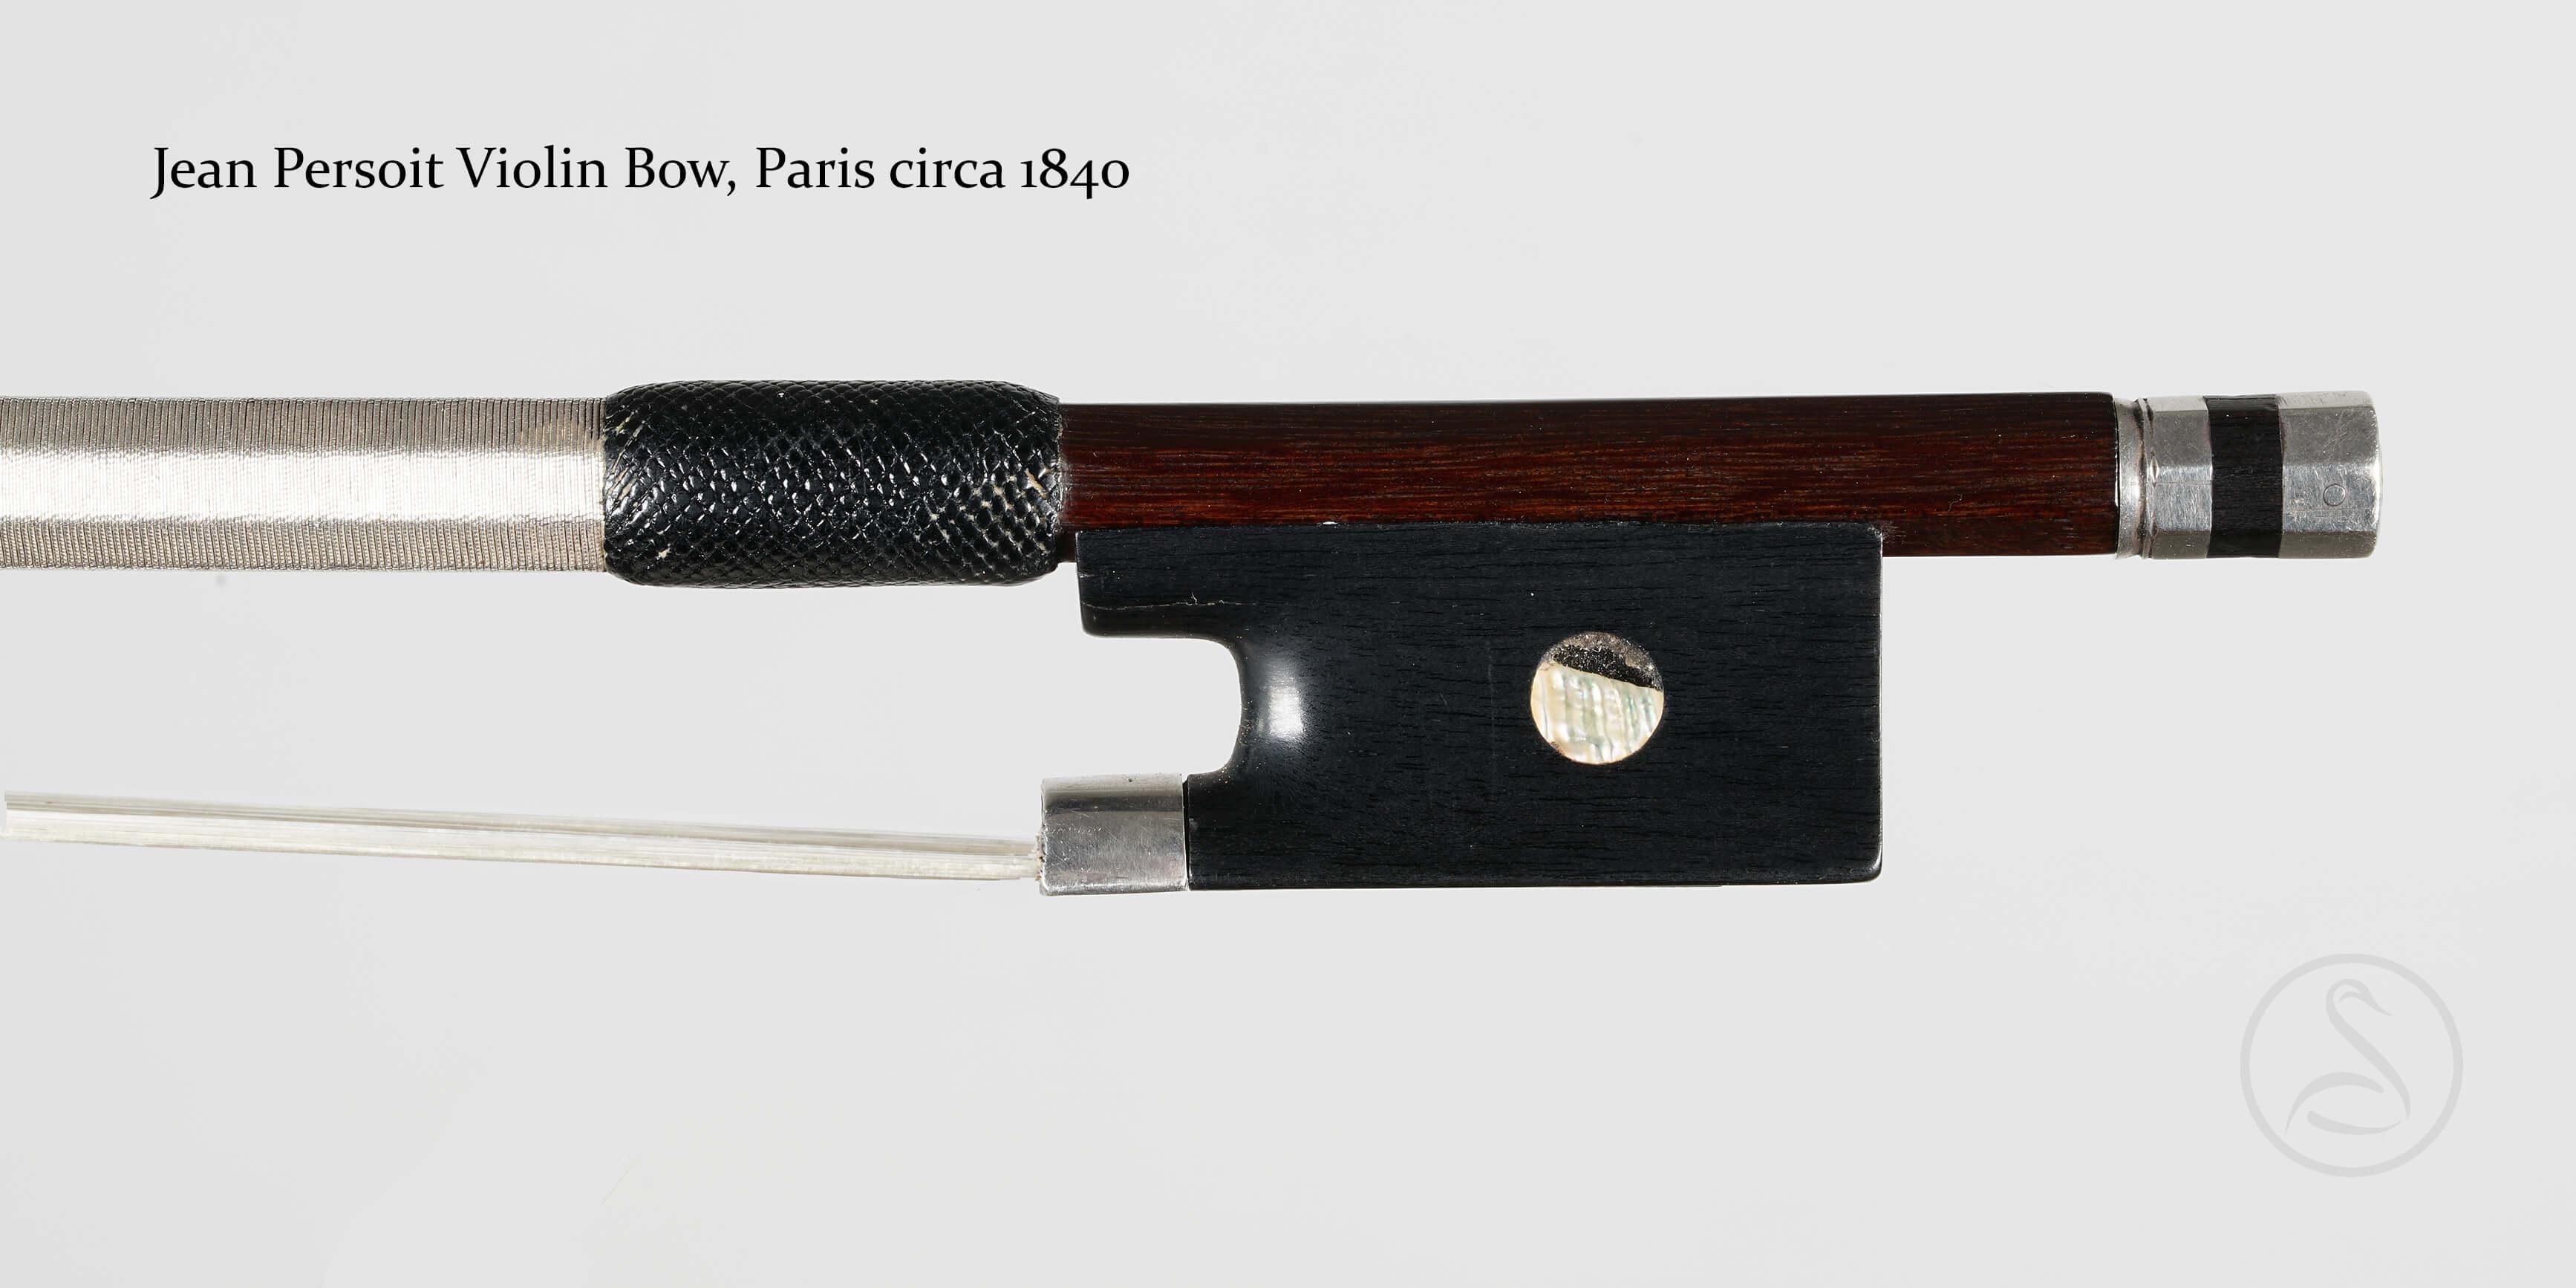 Jean Persoit Violin Bow, Paris circa 1840